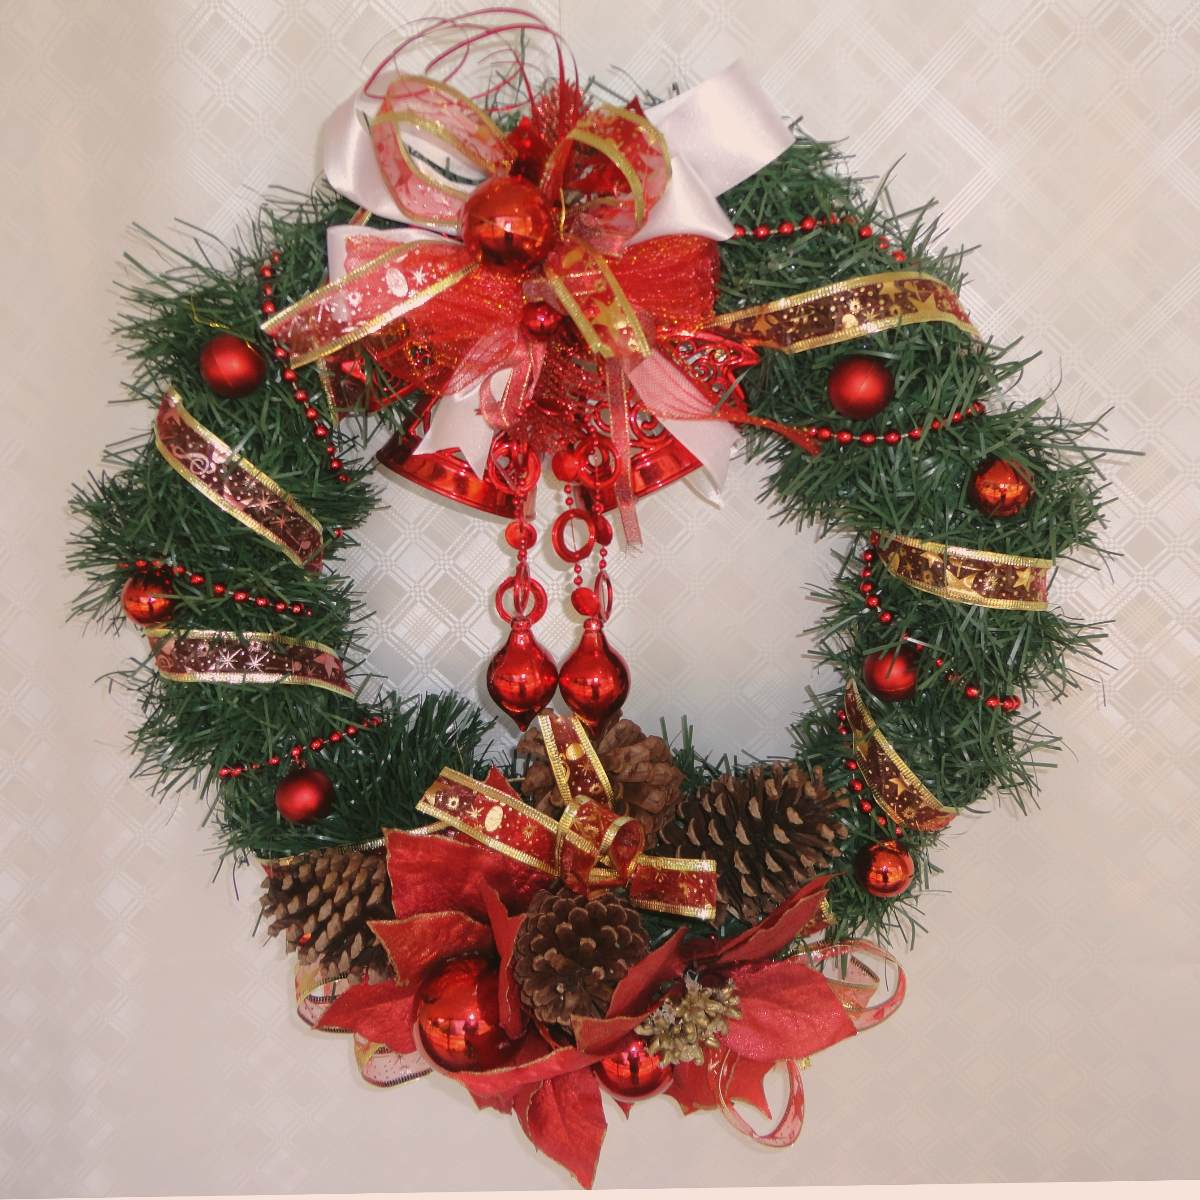 Enfeites De Natal Para Porta Sugest Es Diversas Revista Das  -> Enfeites De Fotos